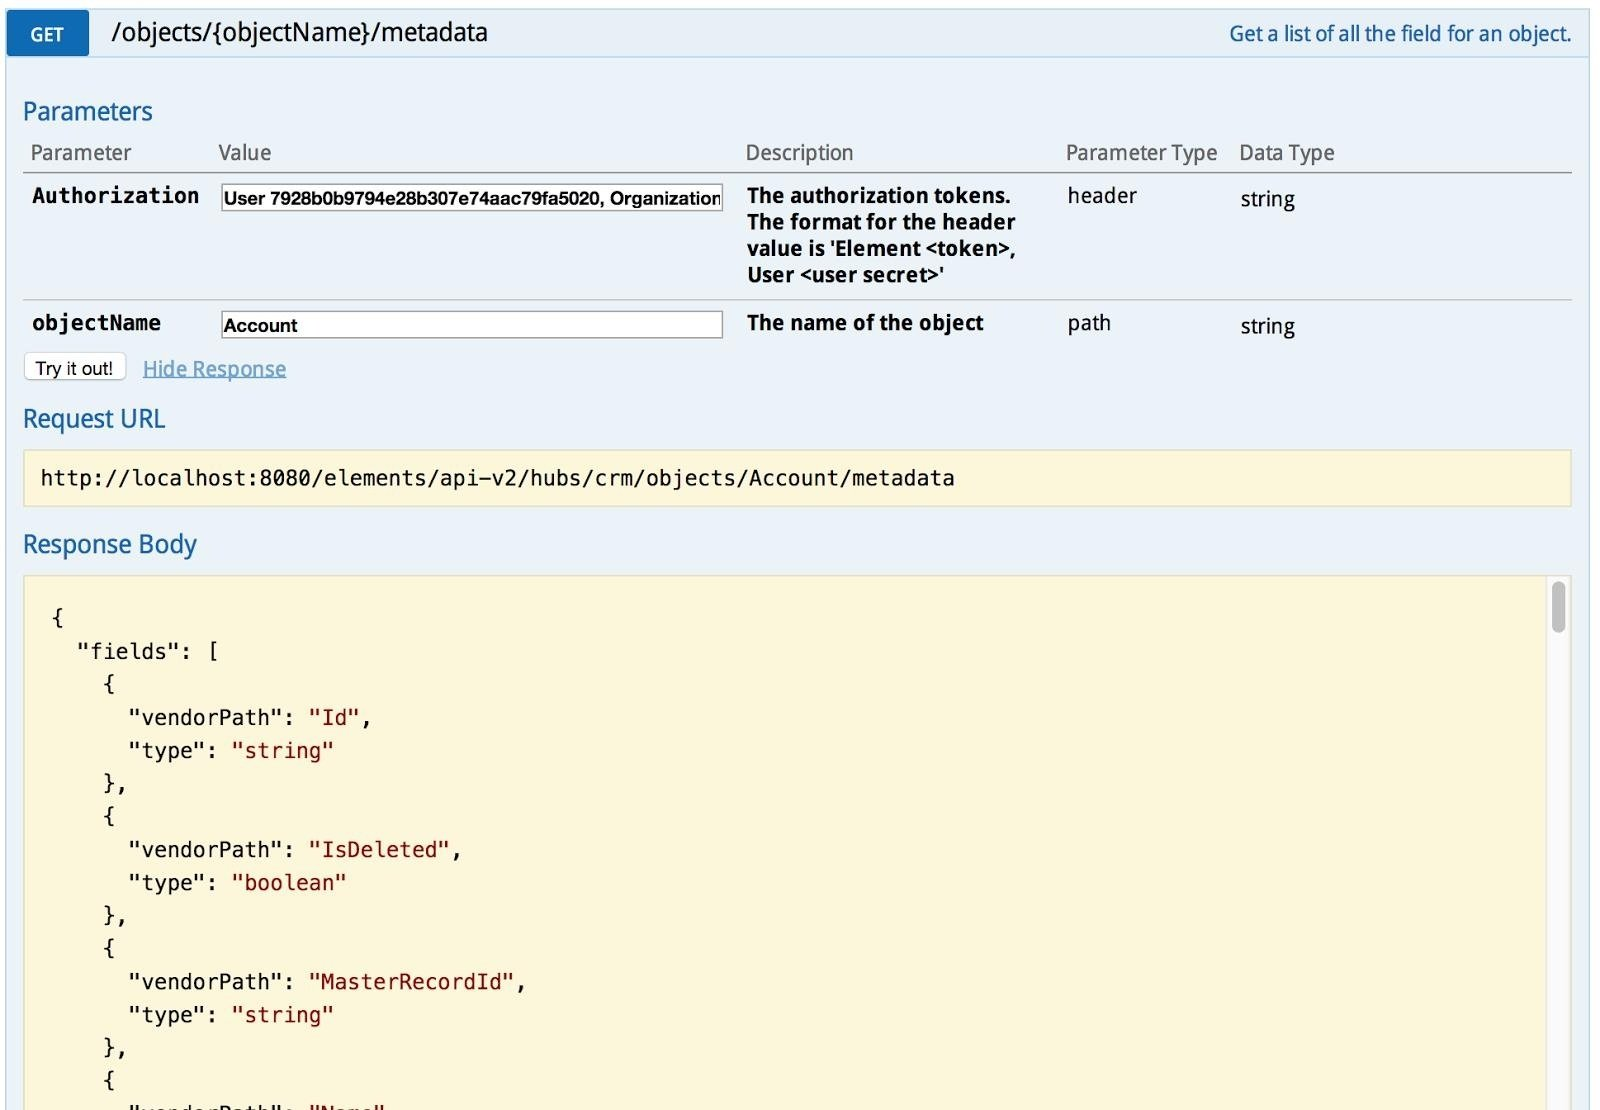 Retrieve the metadata for an object: call the /objects/{objectName}/metadata API